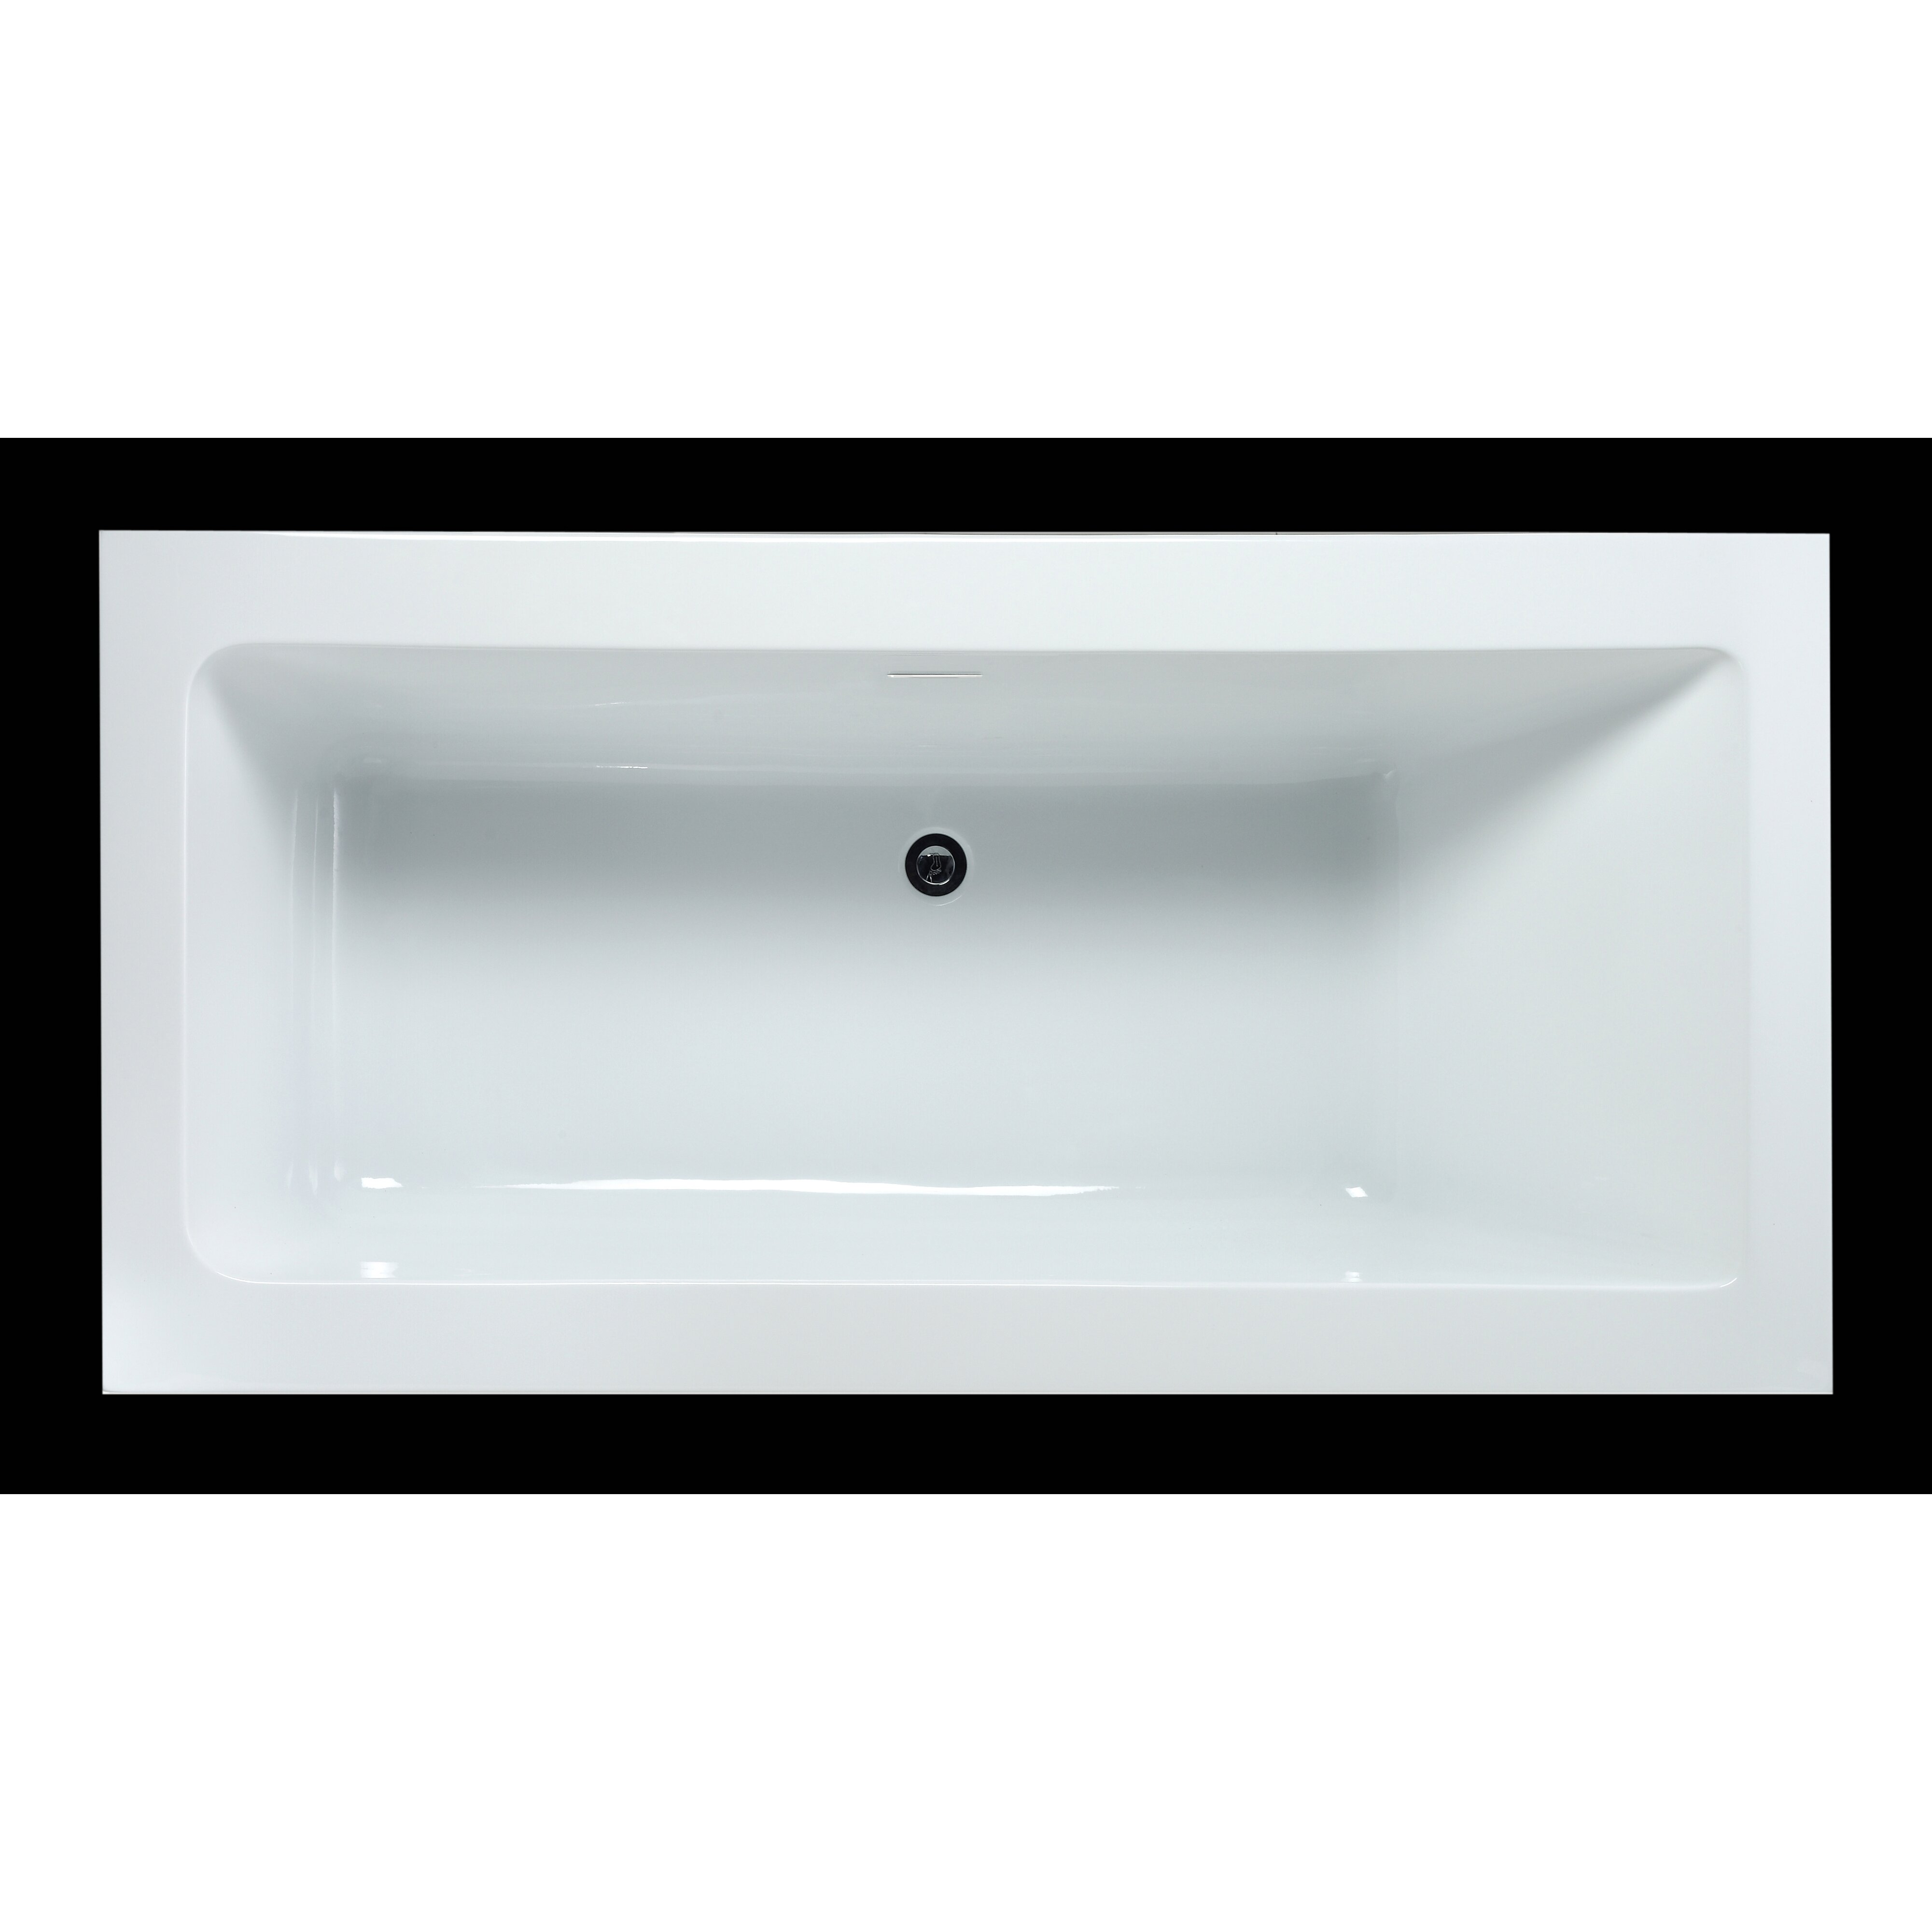 Ove Decors Shower Doors Ove Decors Terra 70 X 3425 Soaking Bathtub Reviews Wayfair